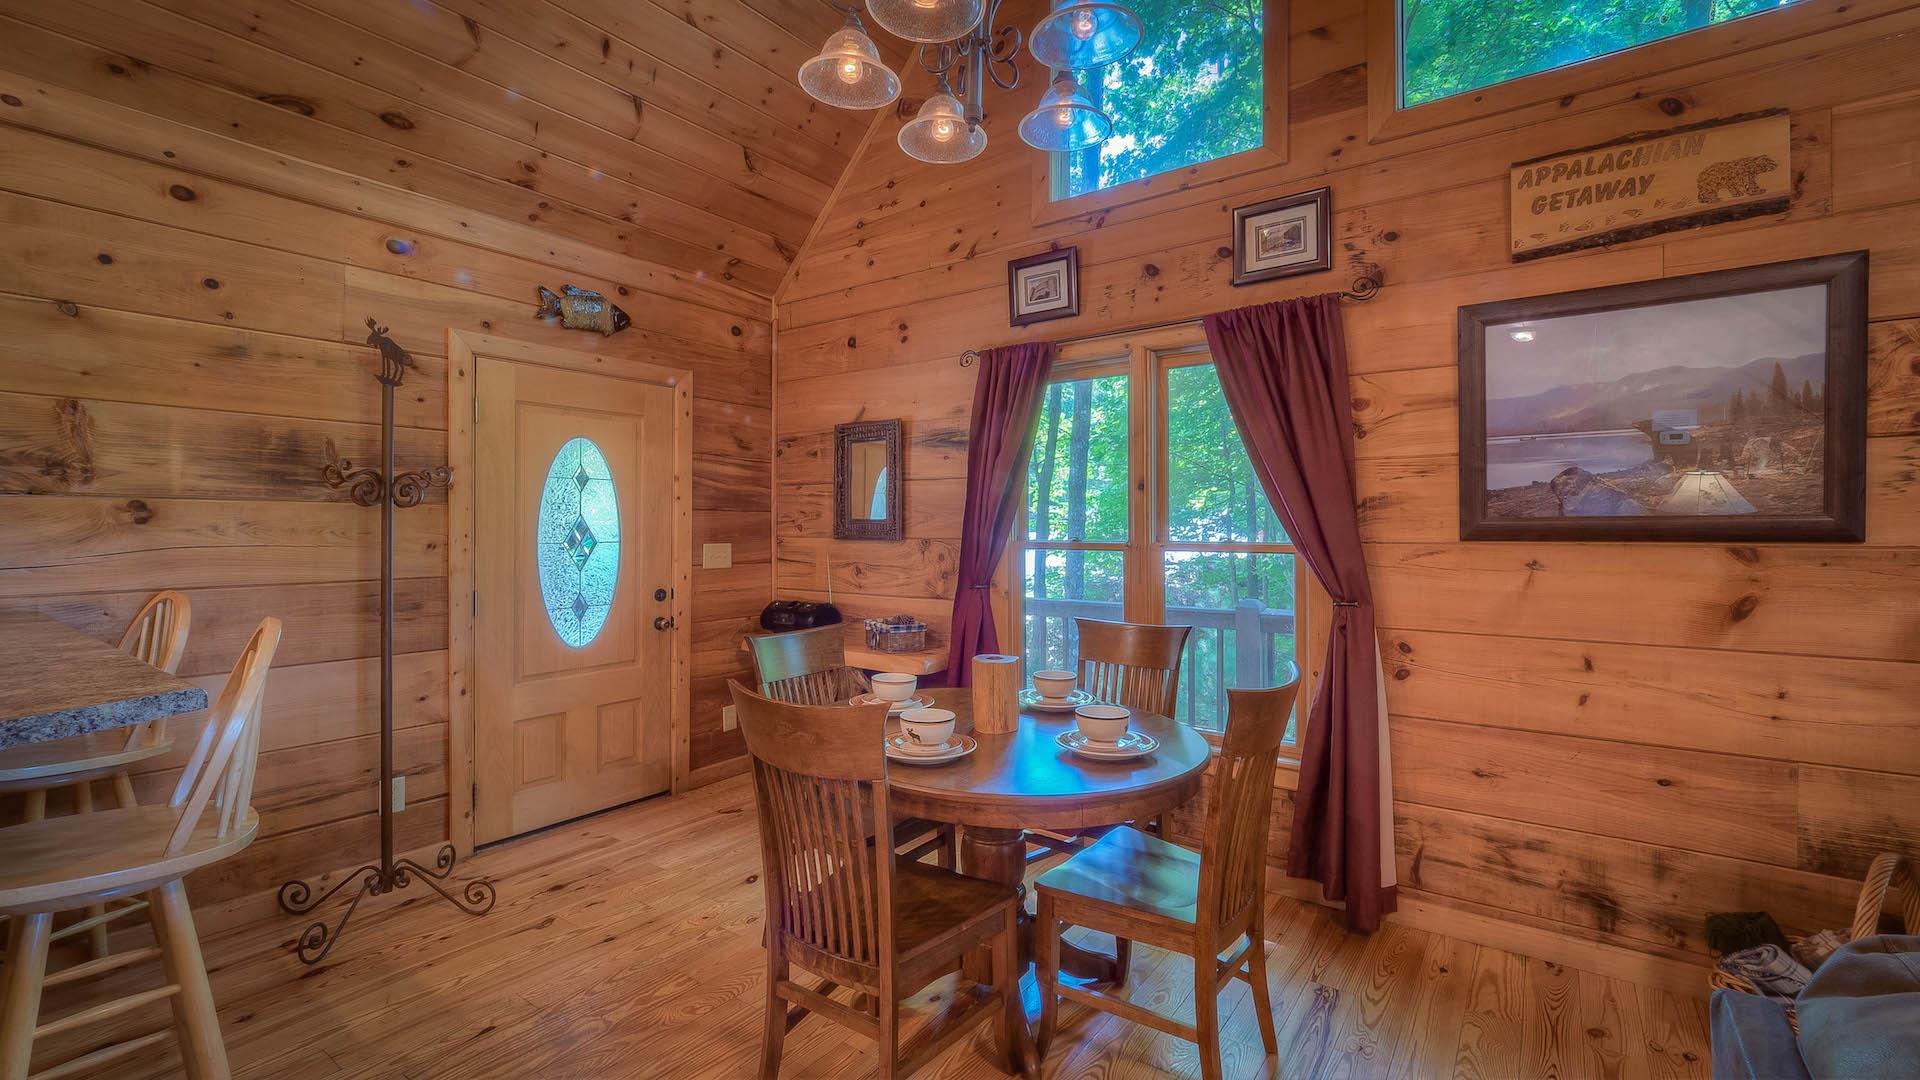 Appalachian Getaway Rental Cabin - Blue Ridge, GA